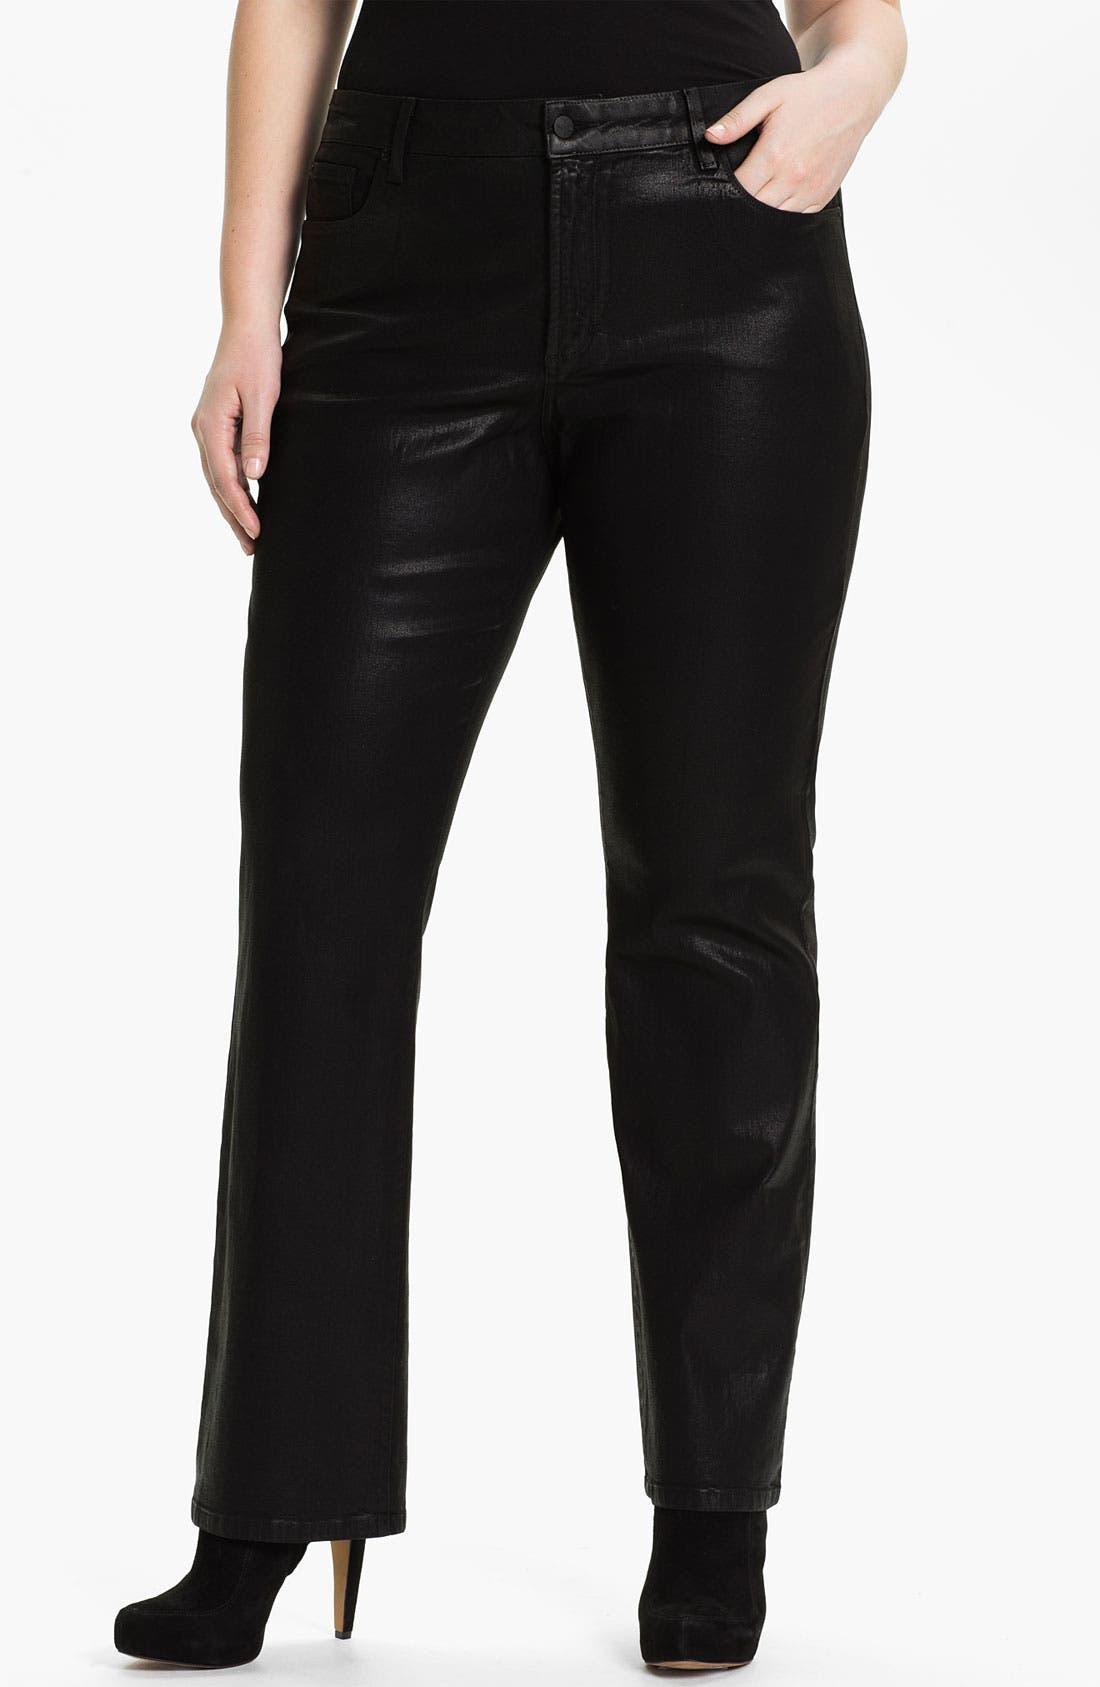 Alternate Image 1 Selected - NYDJ 'Marilyn' Coated Bootcut Jeans (Plus)